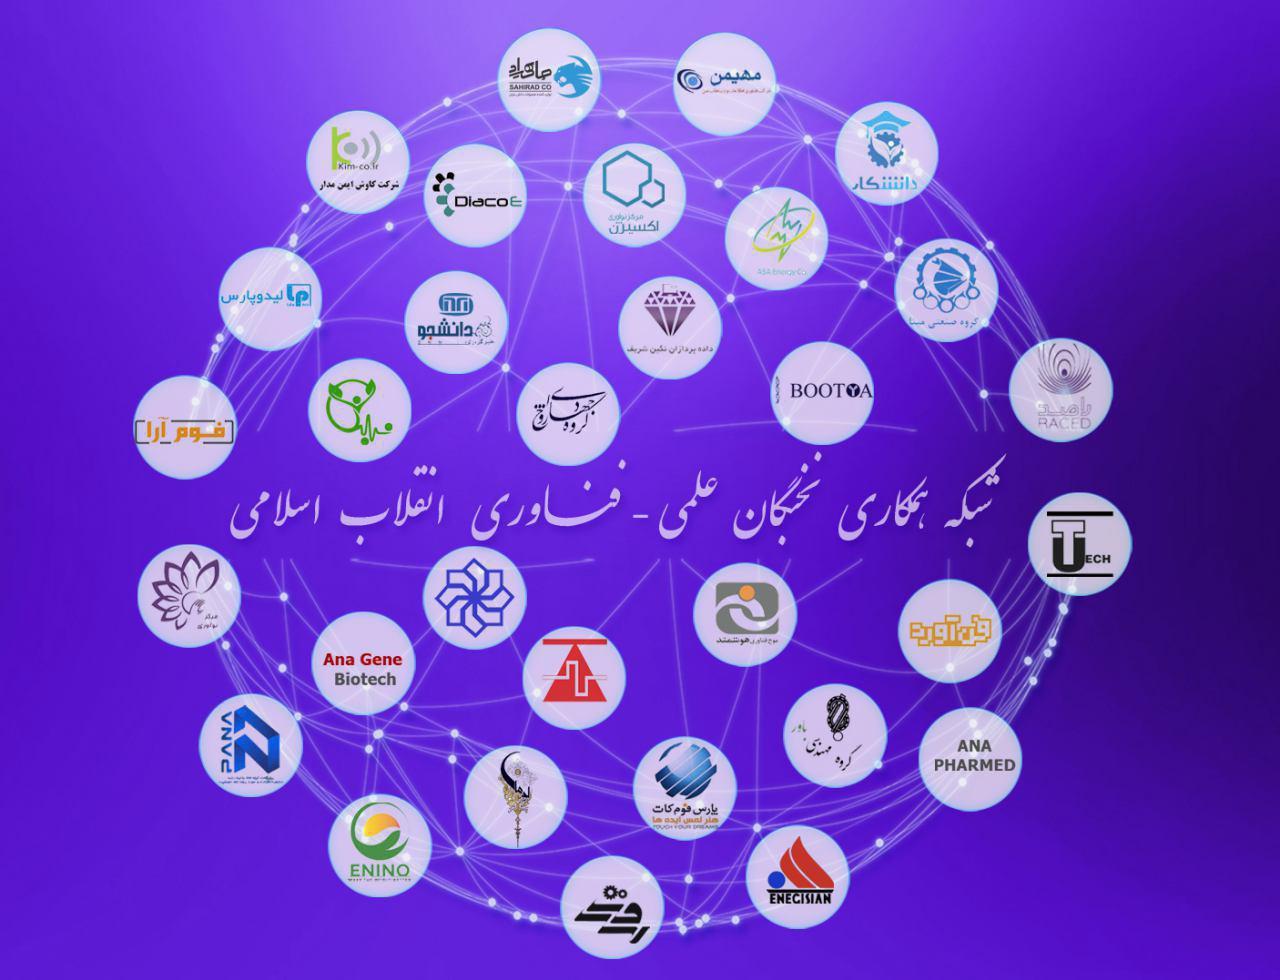 شبکه همکاری